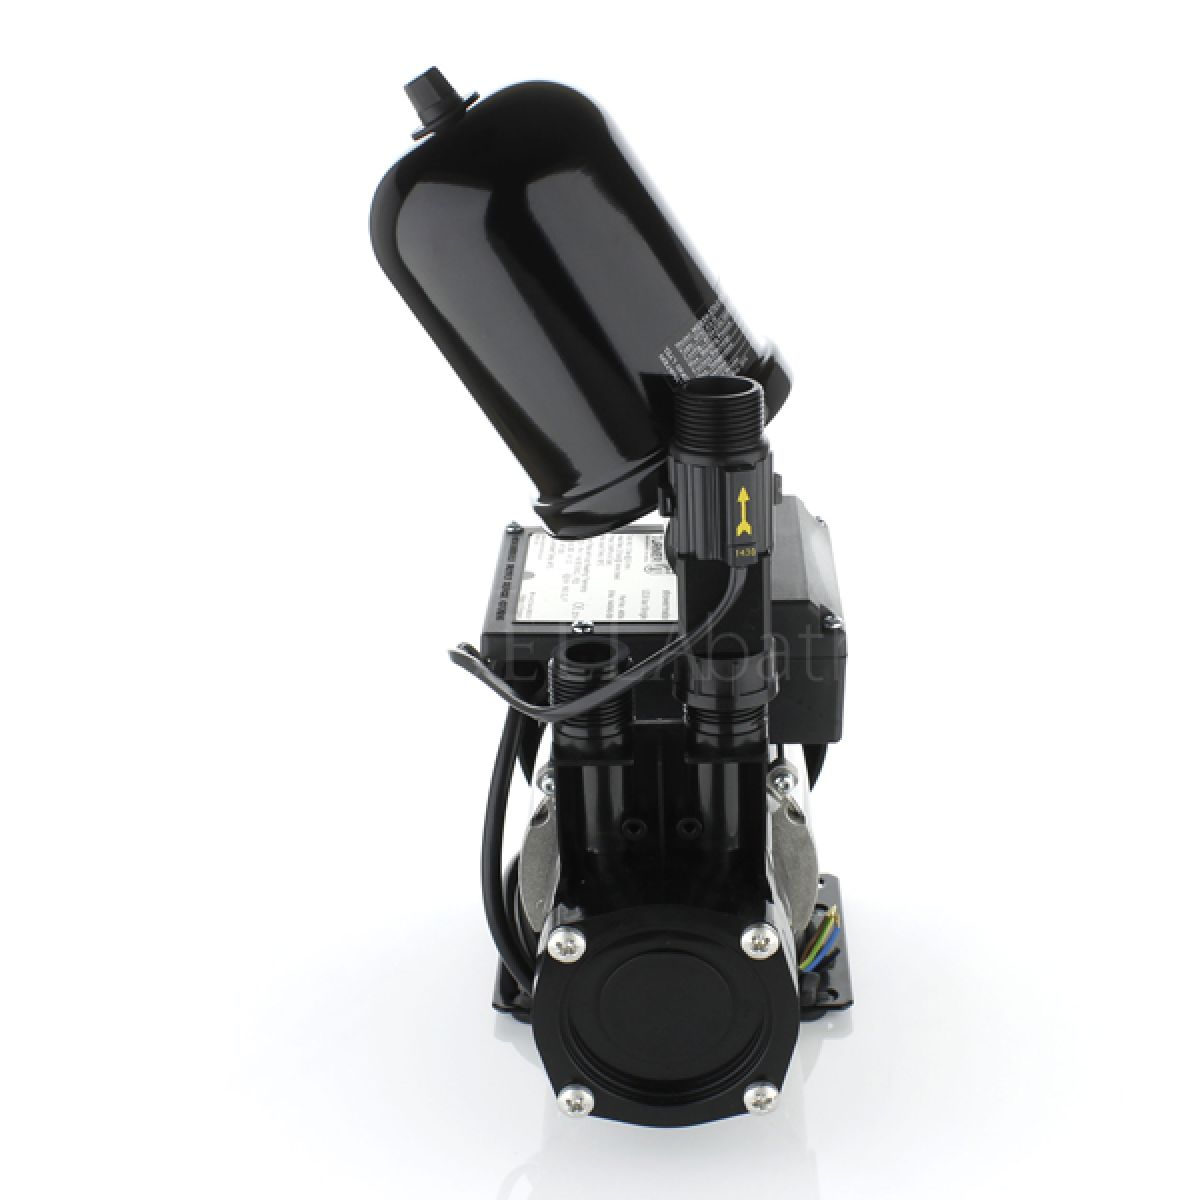 Stuart Turner 46534 Showermate Universal Single 2.6 Bar Pump Right